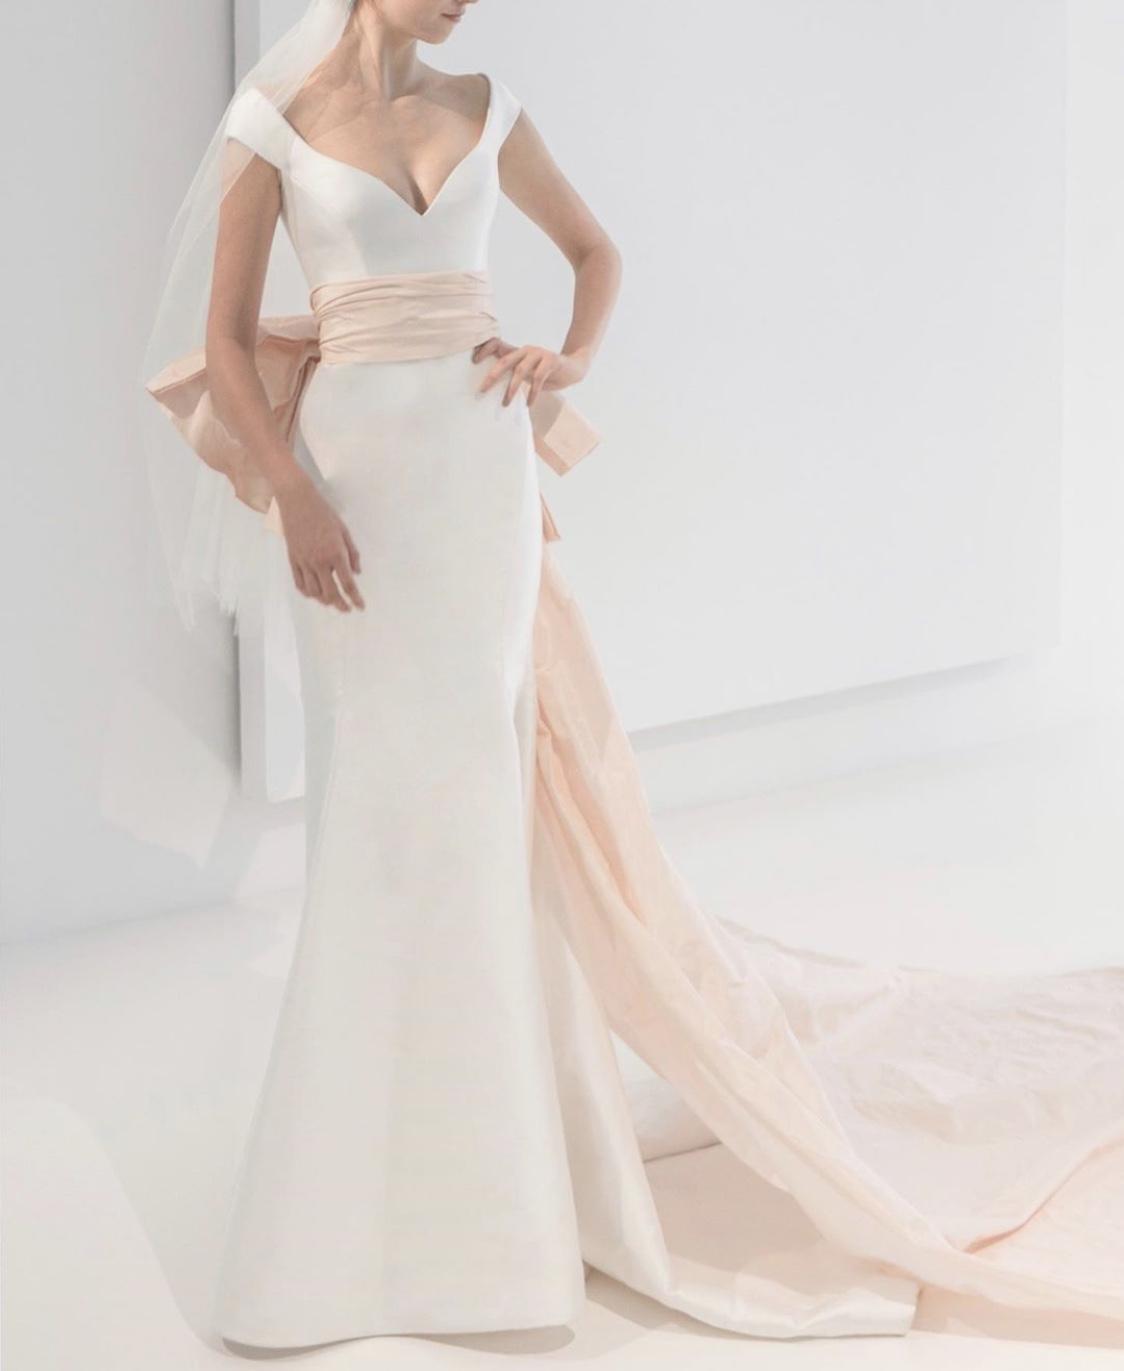 Simple Sleeveless Mermaid Wedding Dress Kleinfeld Bridal